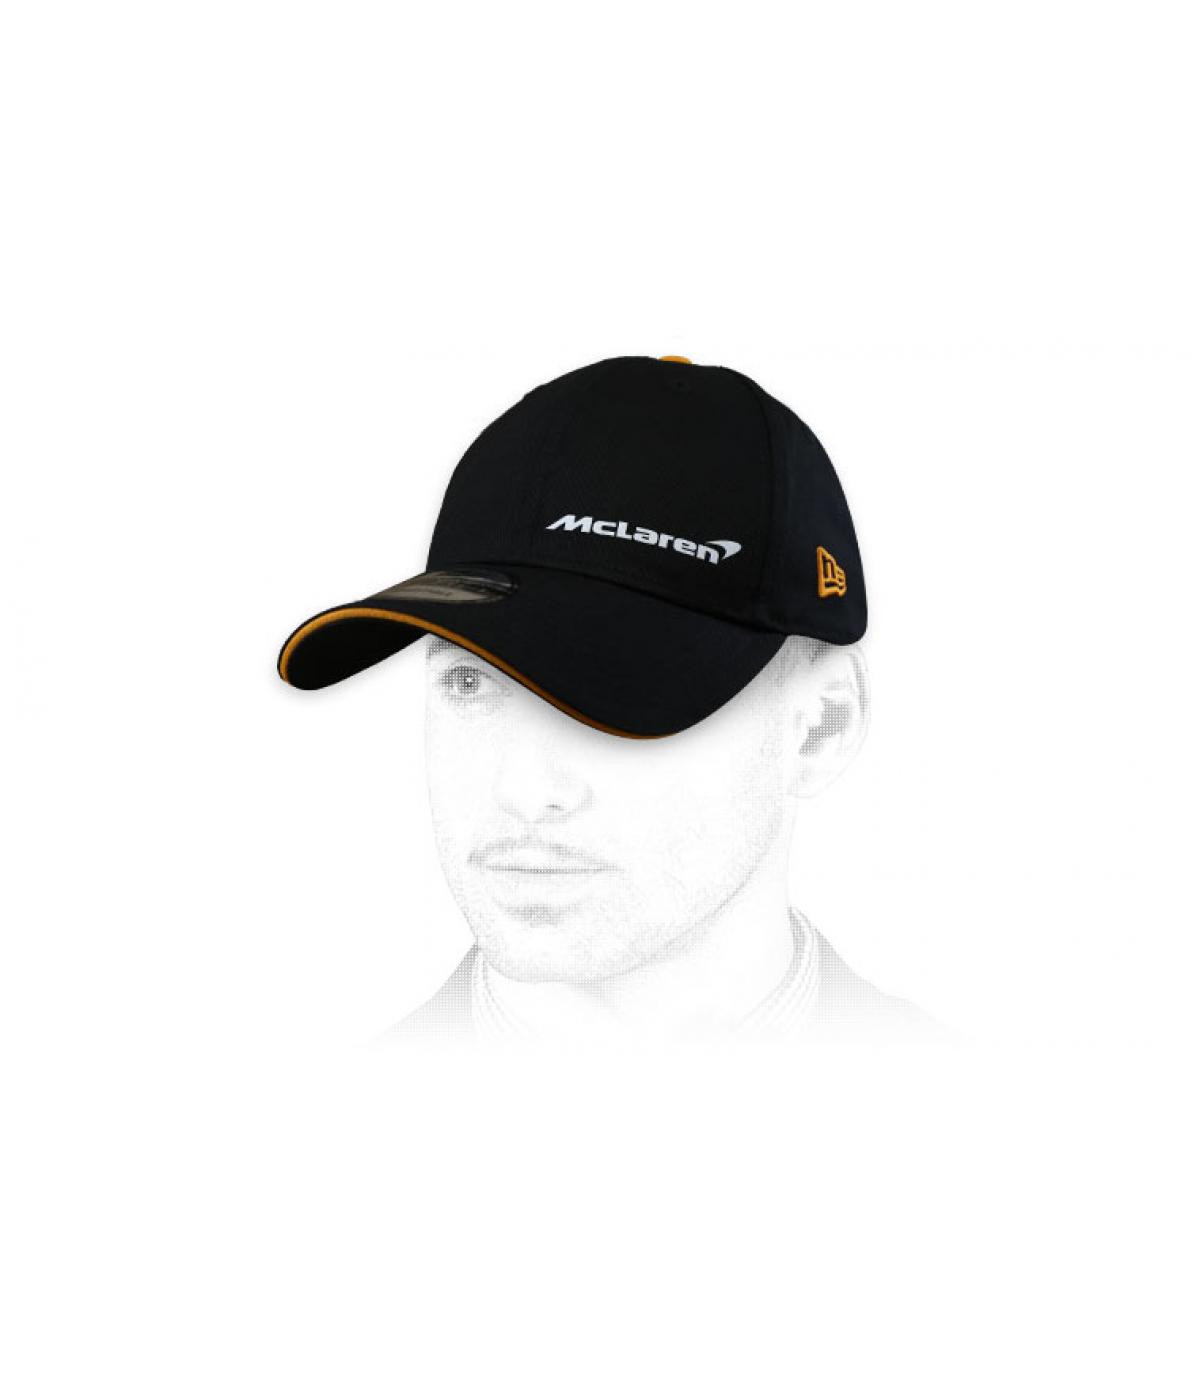 casquette McLaren noir